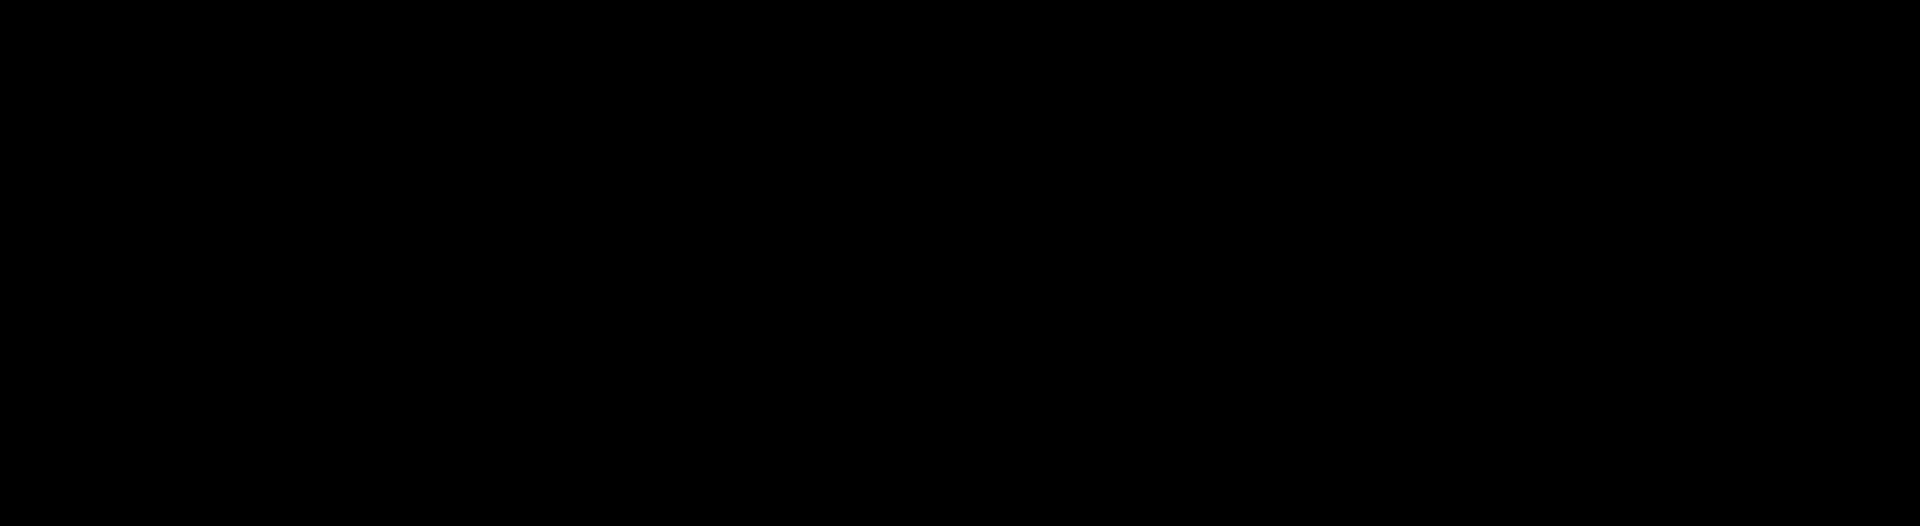 Audiotree Logo - Black Horizontal